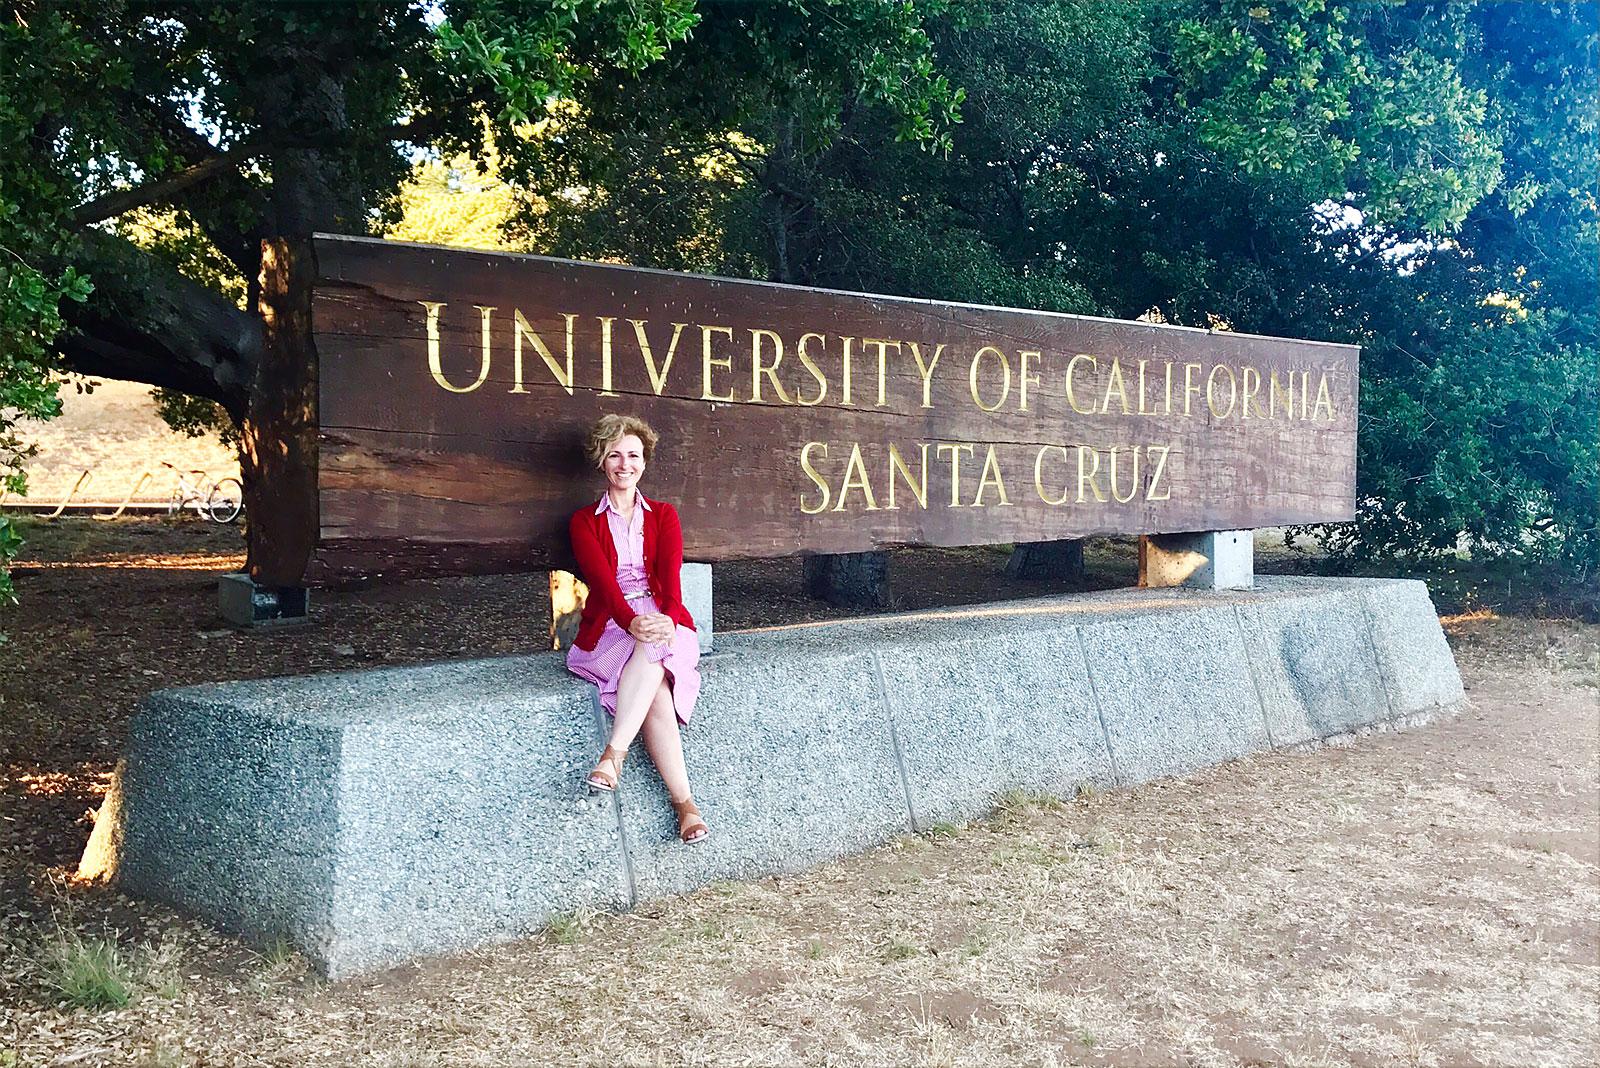 Rita Aleluia sentada junto identificador Universidade Santa Cruz, na California